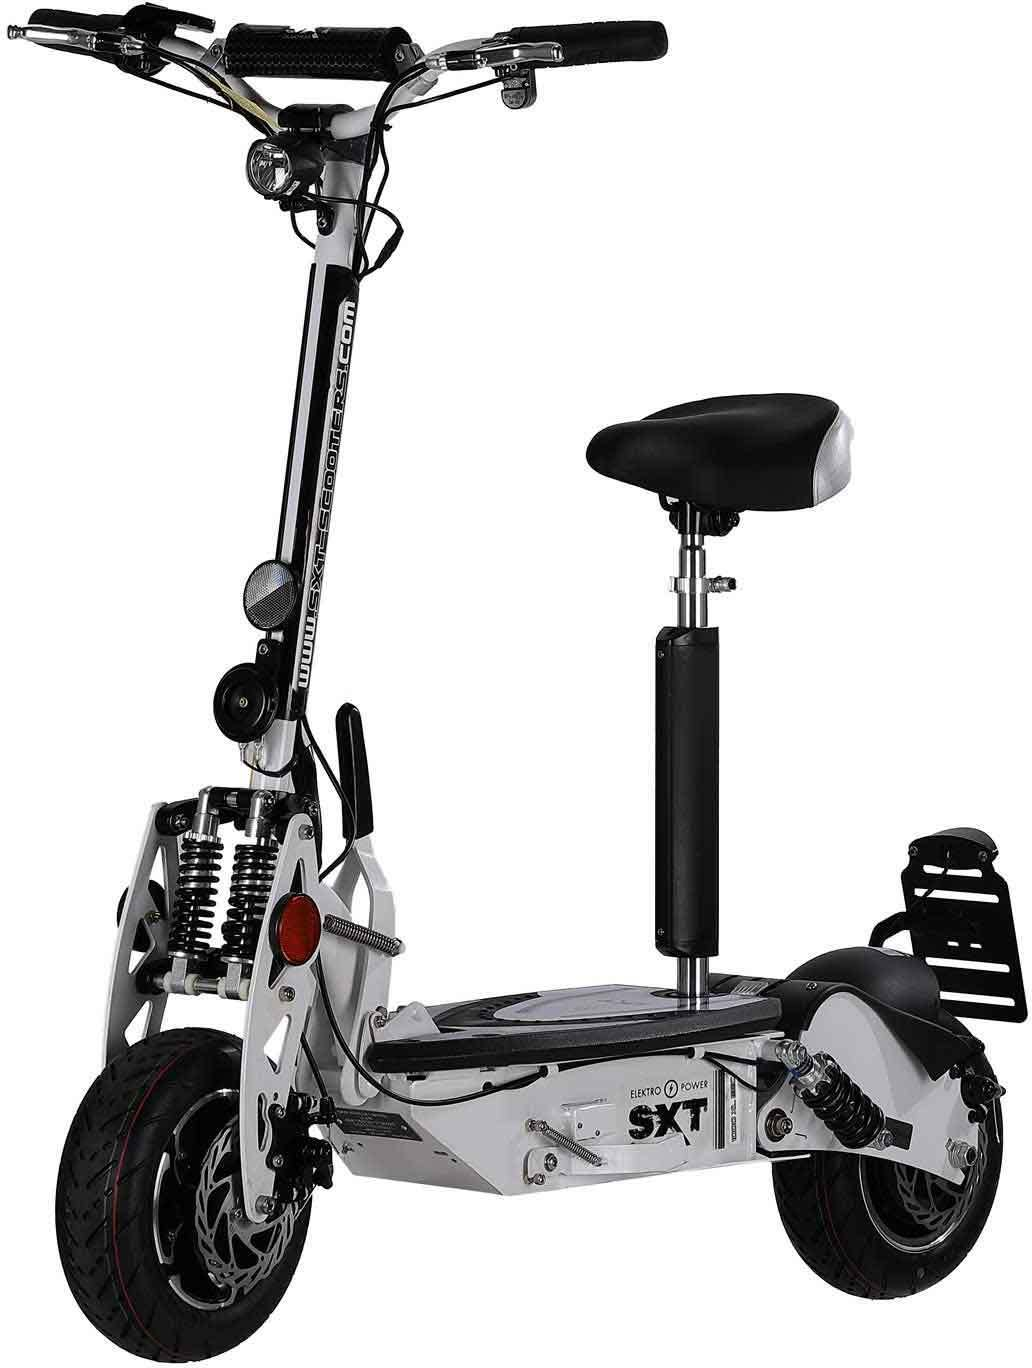 SXT-Scooters E-Scooter Elektro Scooter SXT1000 XL EEC EEC EEC - Facelift 48V 20Ah weiss 426989